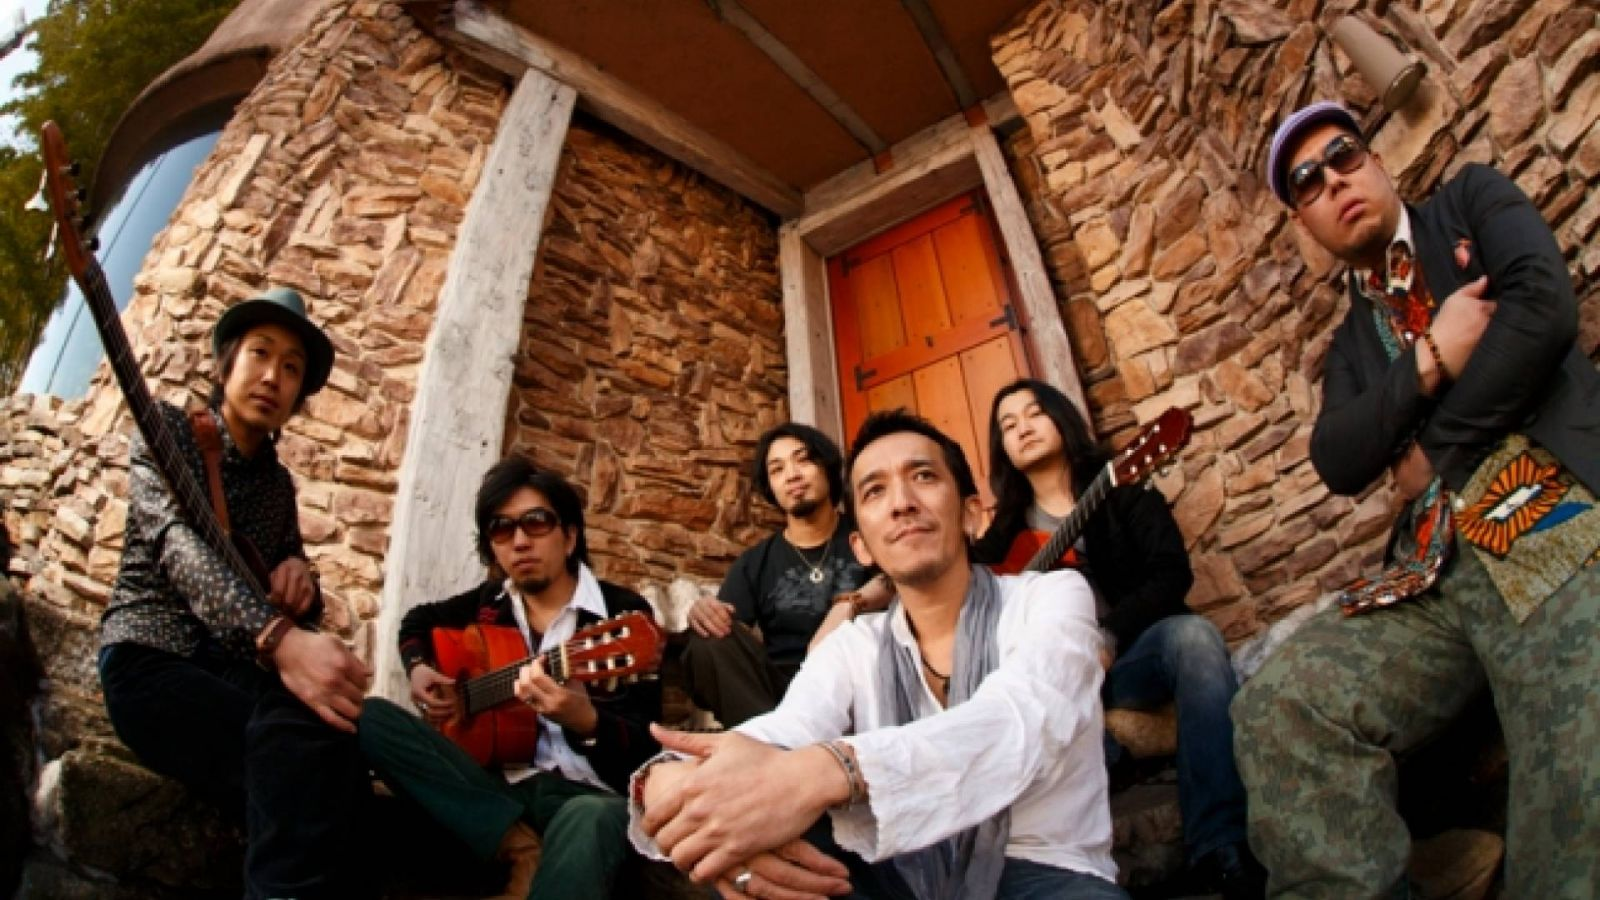 Rockamenco © Avex Entertainment Inc.